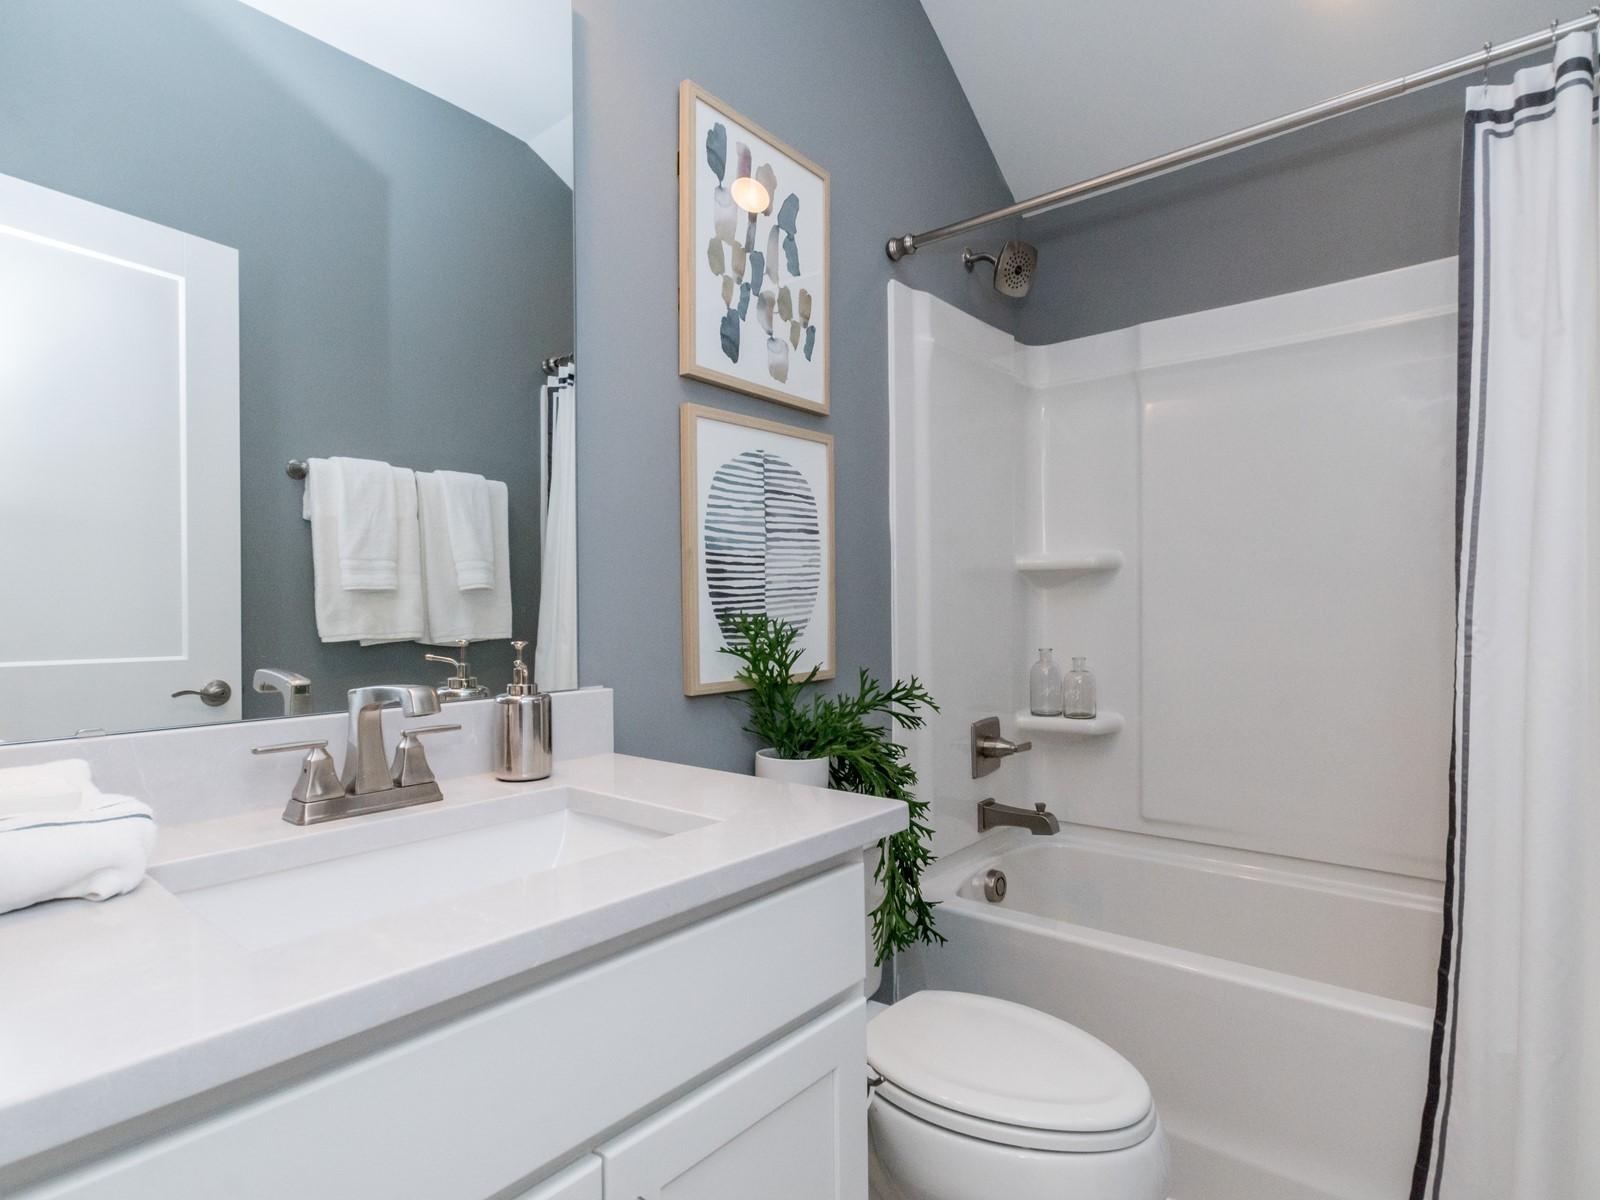 img_022_Hallway-Full-Bathroom.jpg